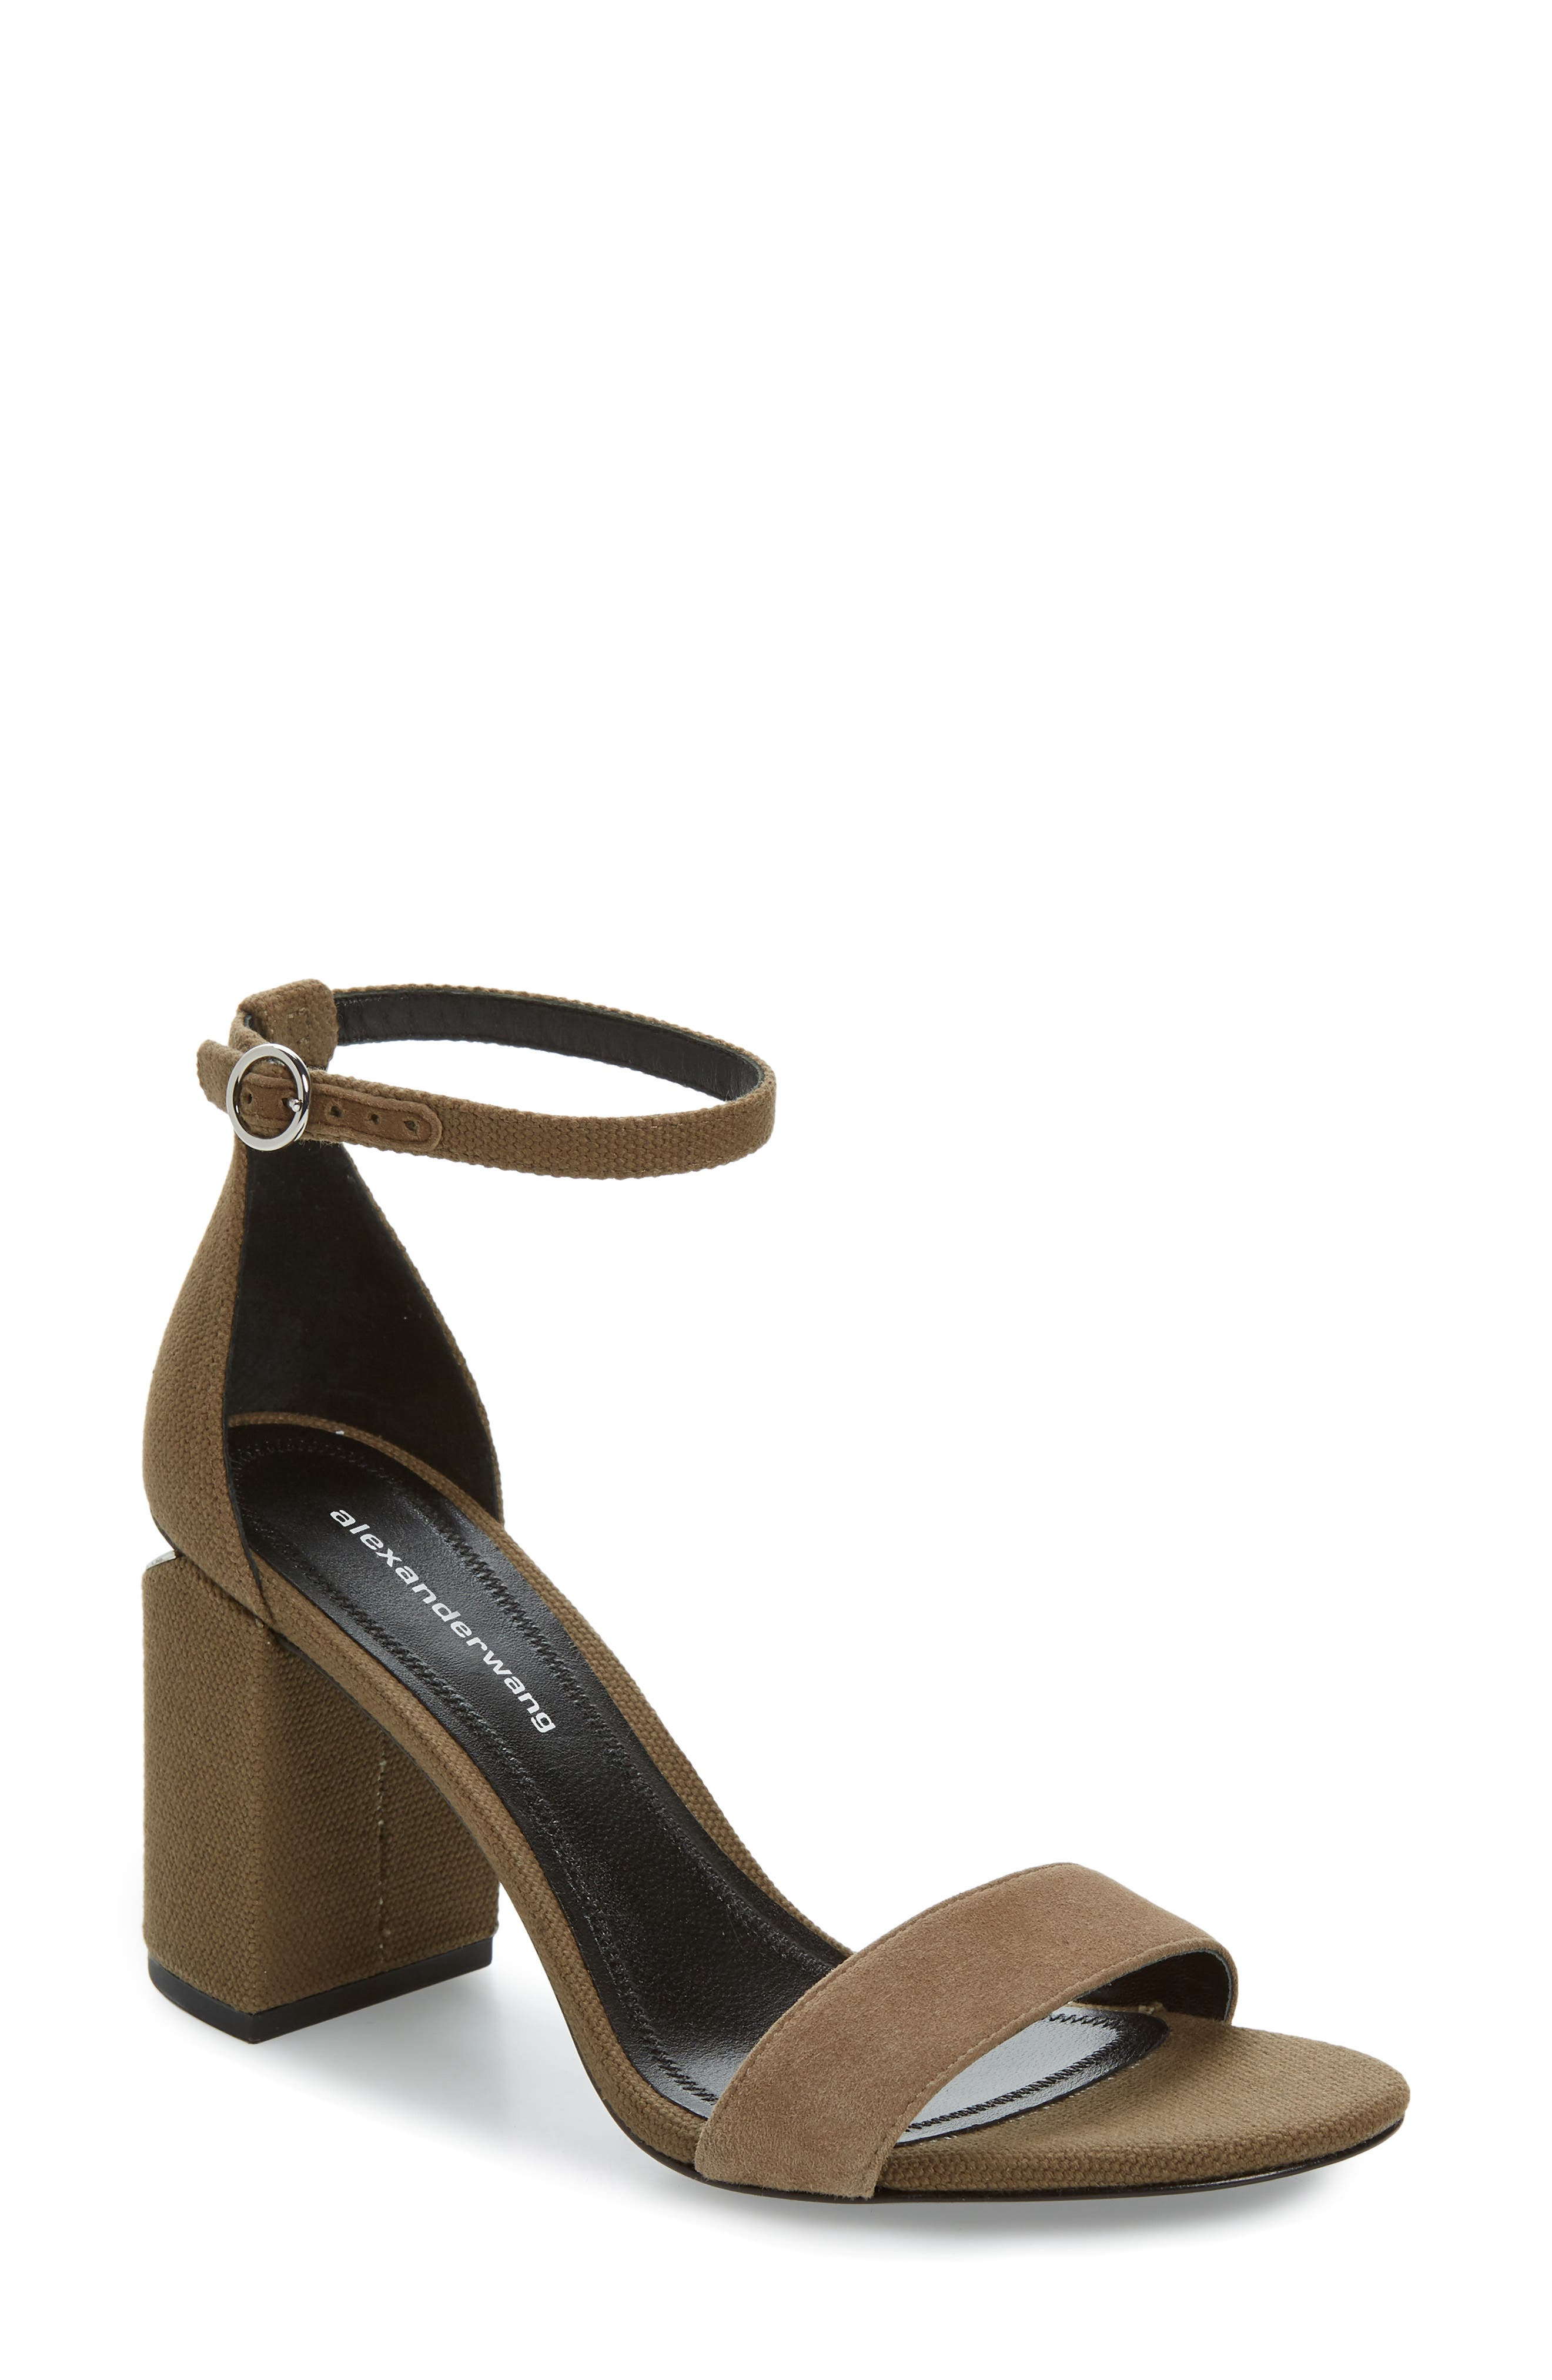 Alexander Wang New Abby Ankle Strap Sandal, Beige